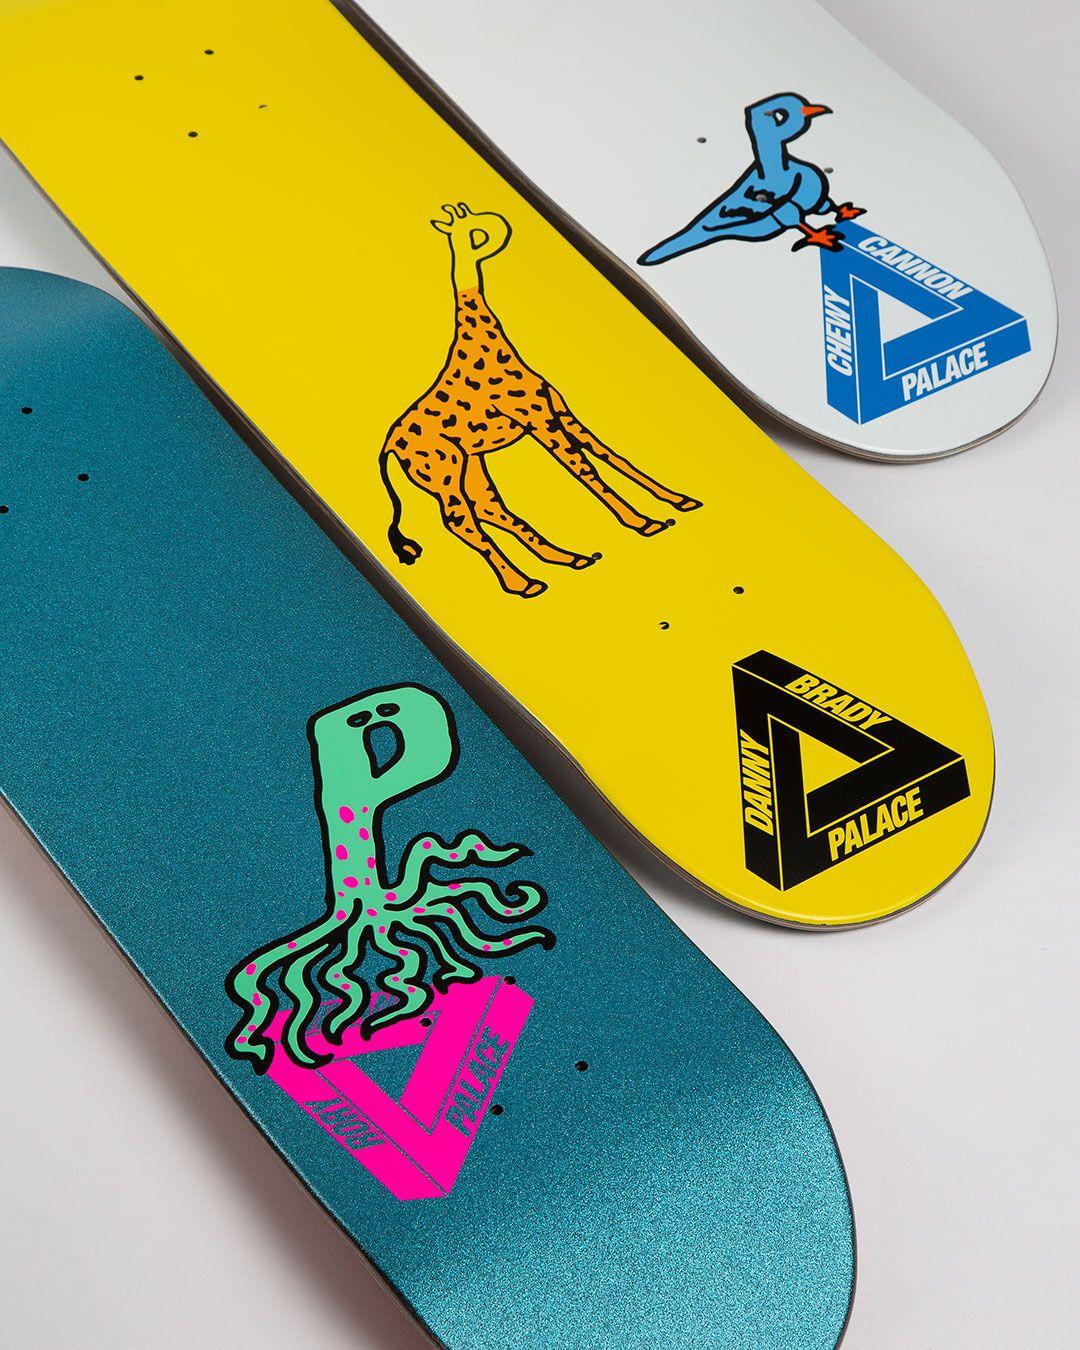 New Palace Decks Skateboard Deck Skaten Skateboard